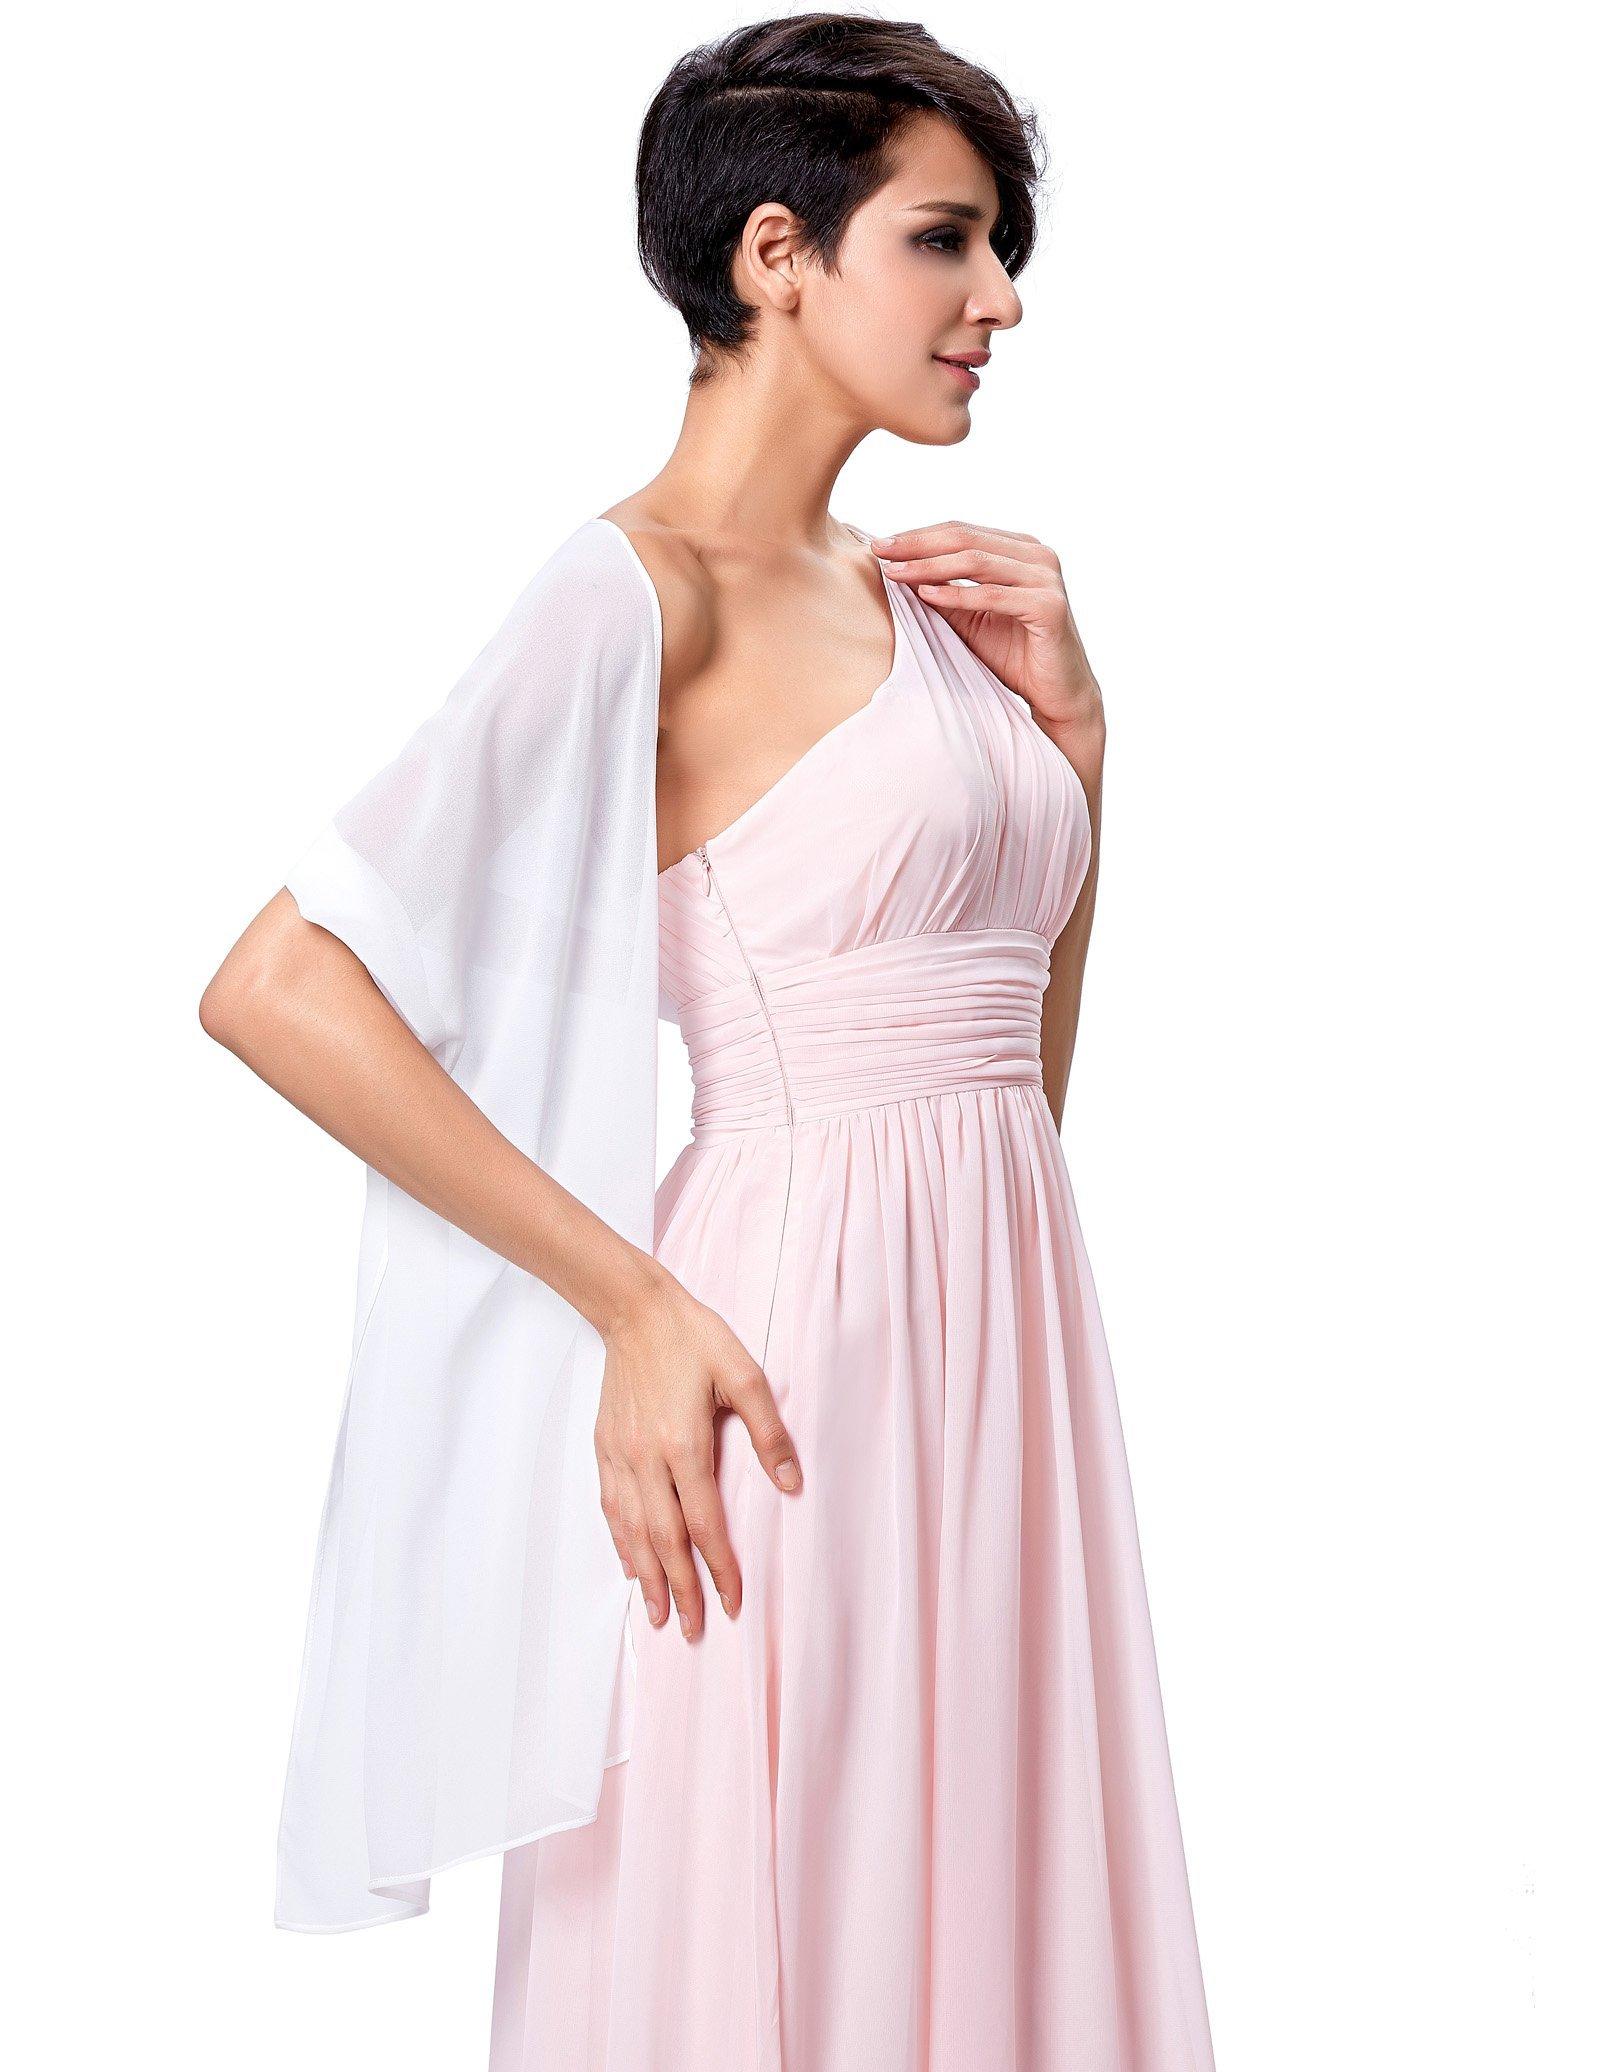 Wedding Soft Chiffon Evening Party Shawls Scarves for Women White KK229 by Kate Kasin (Image #4)